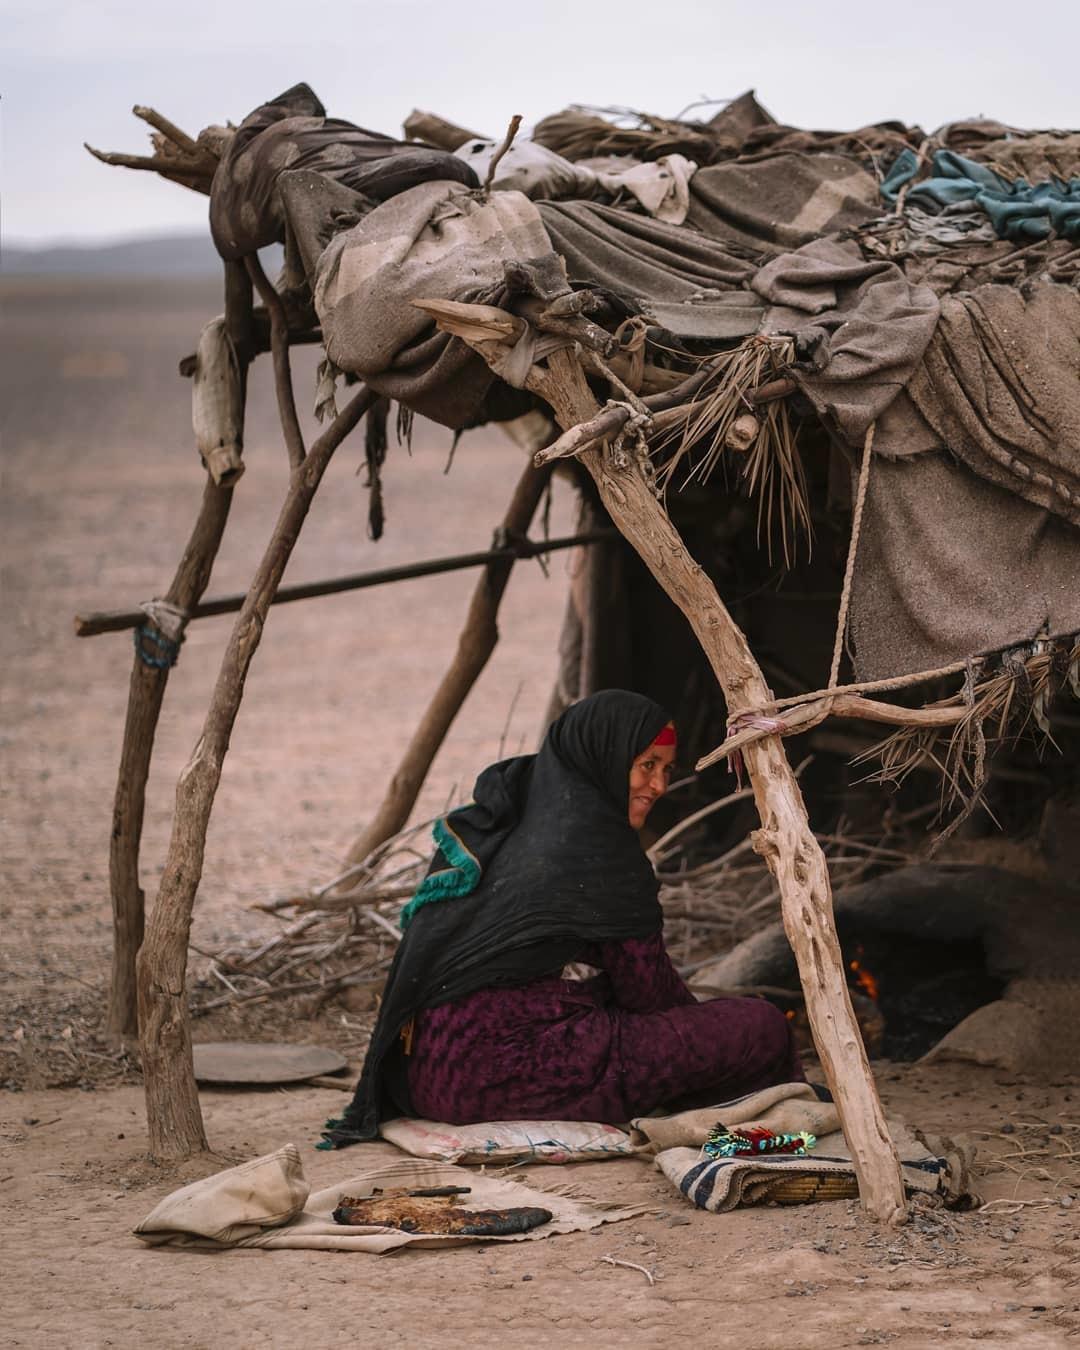 Ruta por Merzouga Una semana en Marruecos-Ruta de 7 dias desde Marrakech